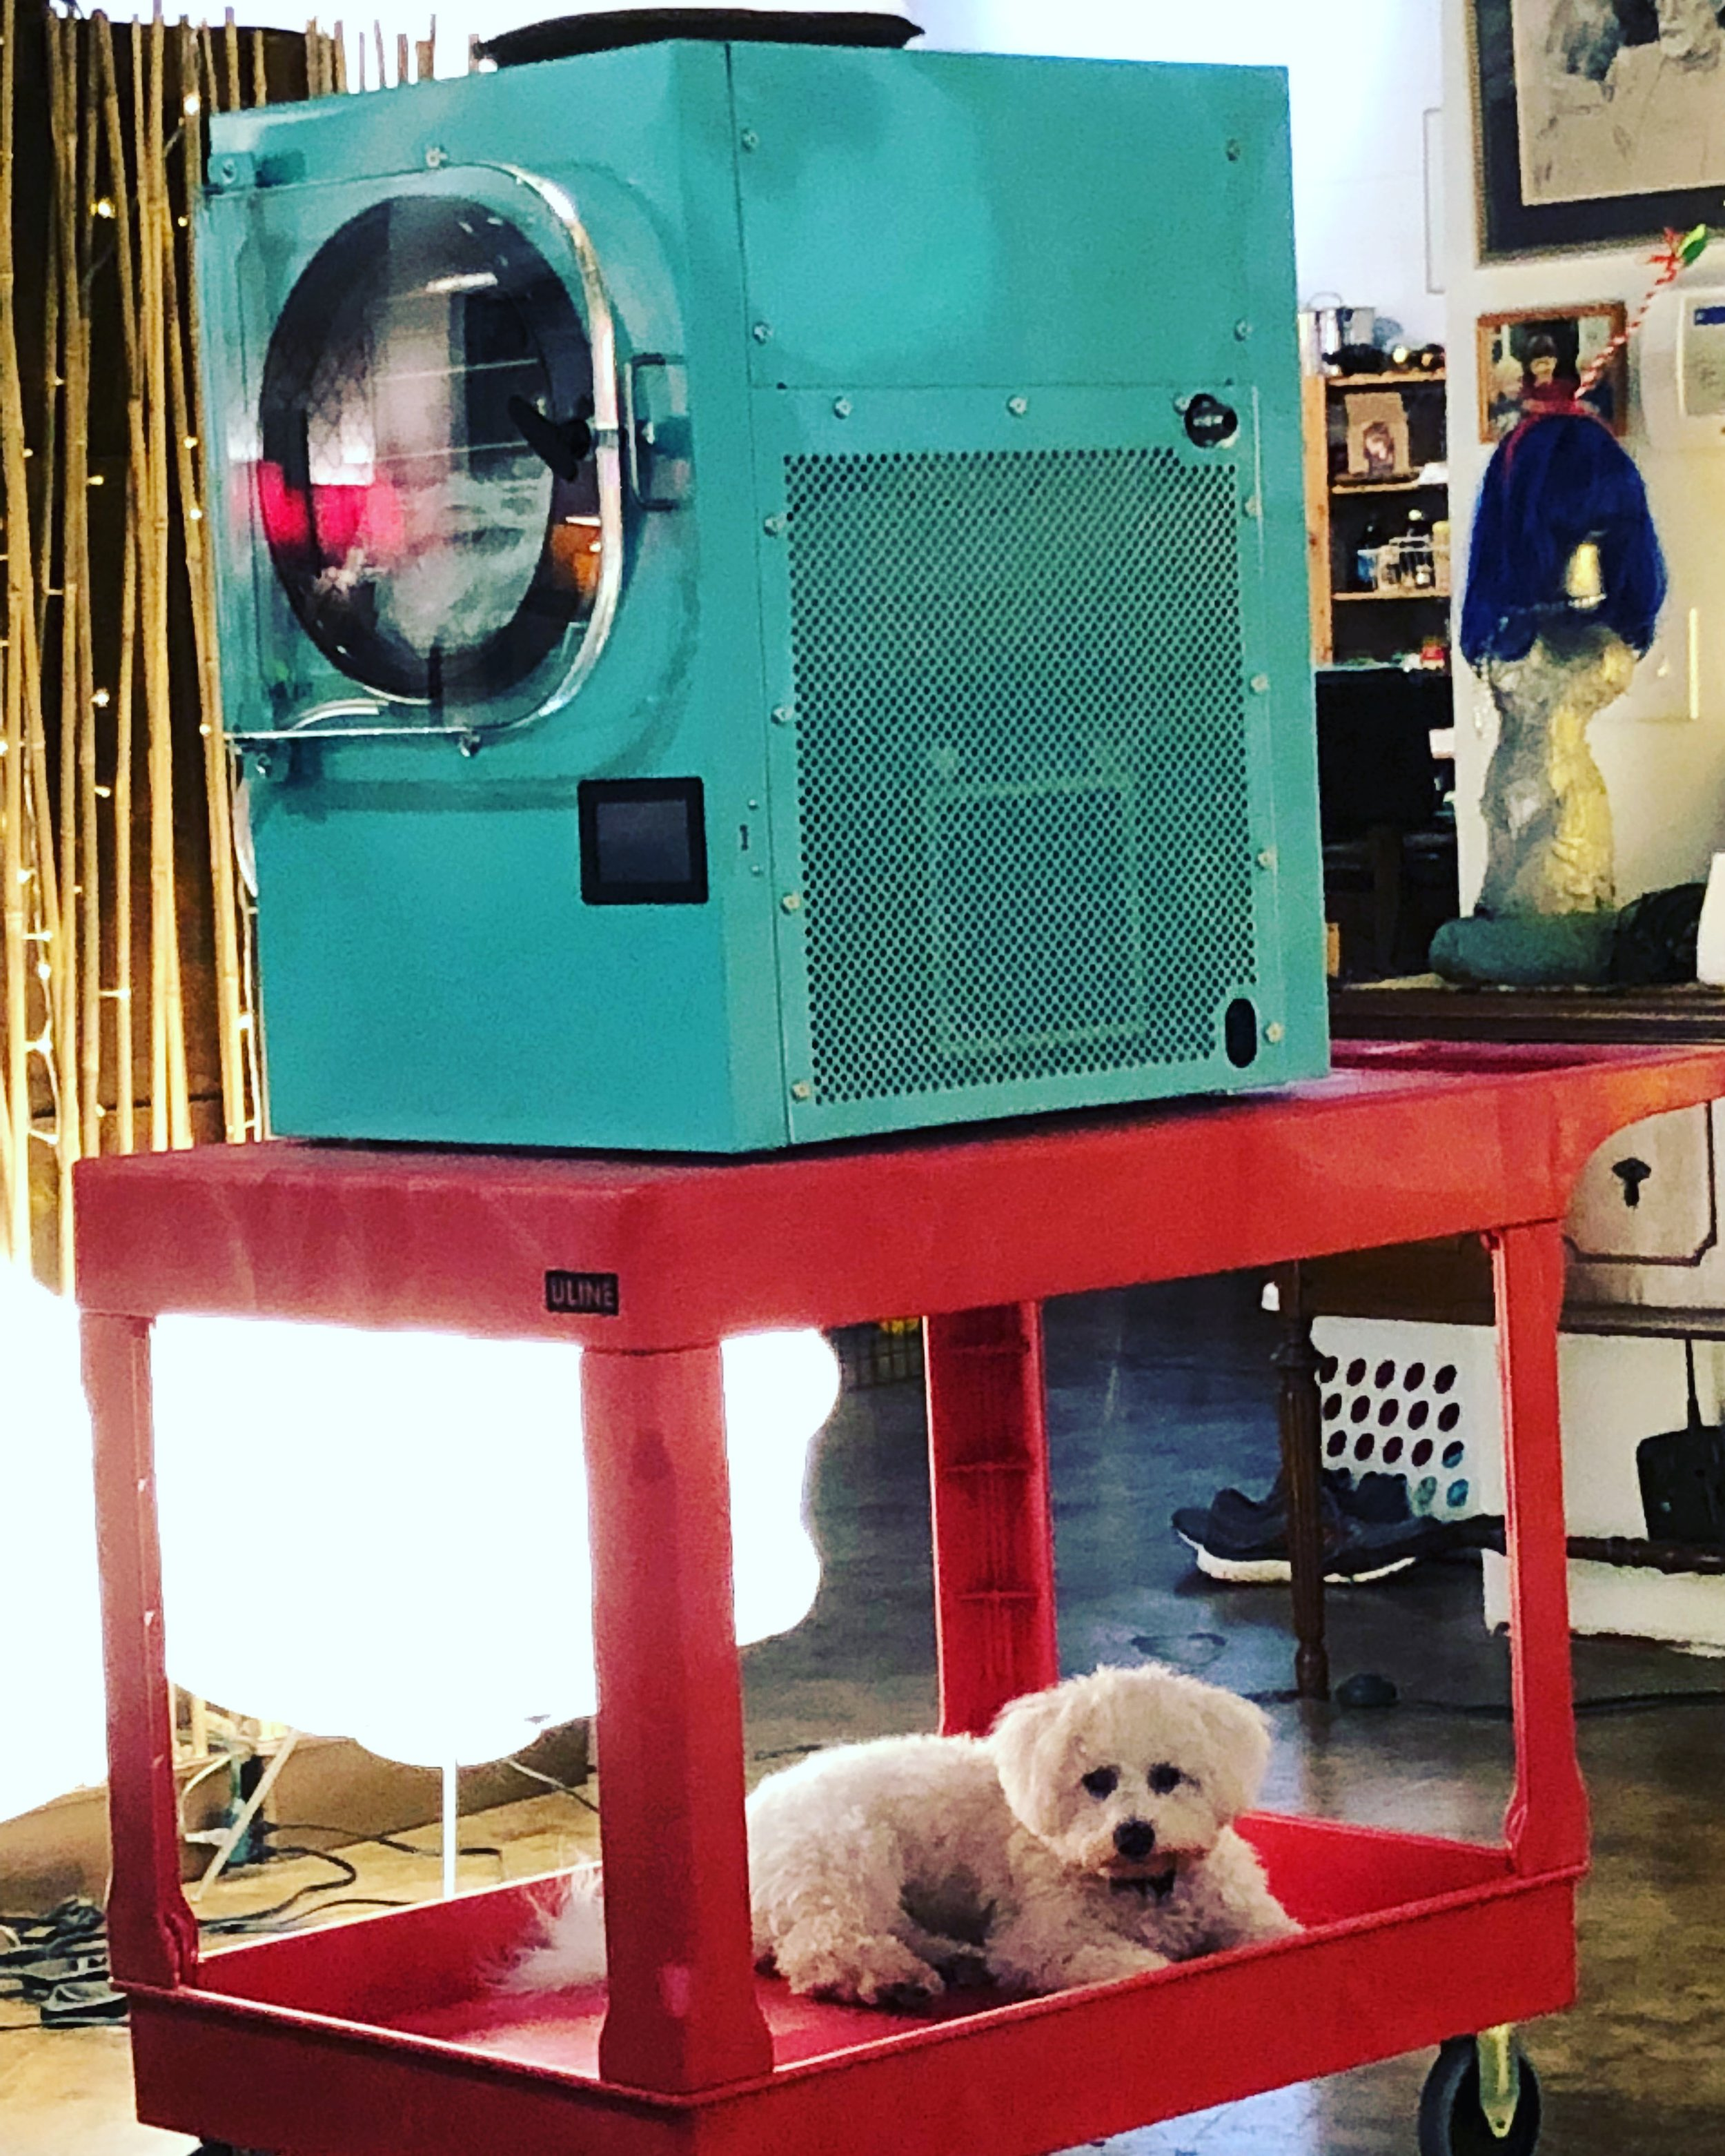 SteveBaxter, commandeering the freeze-dryer cart.